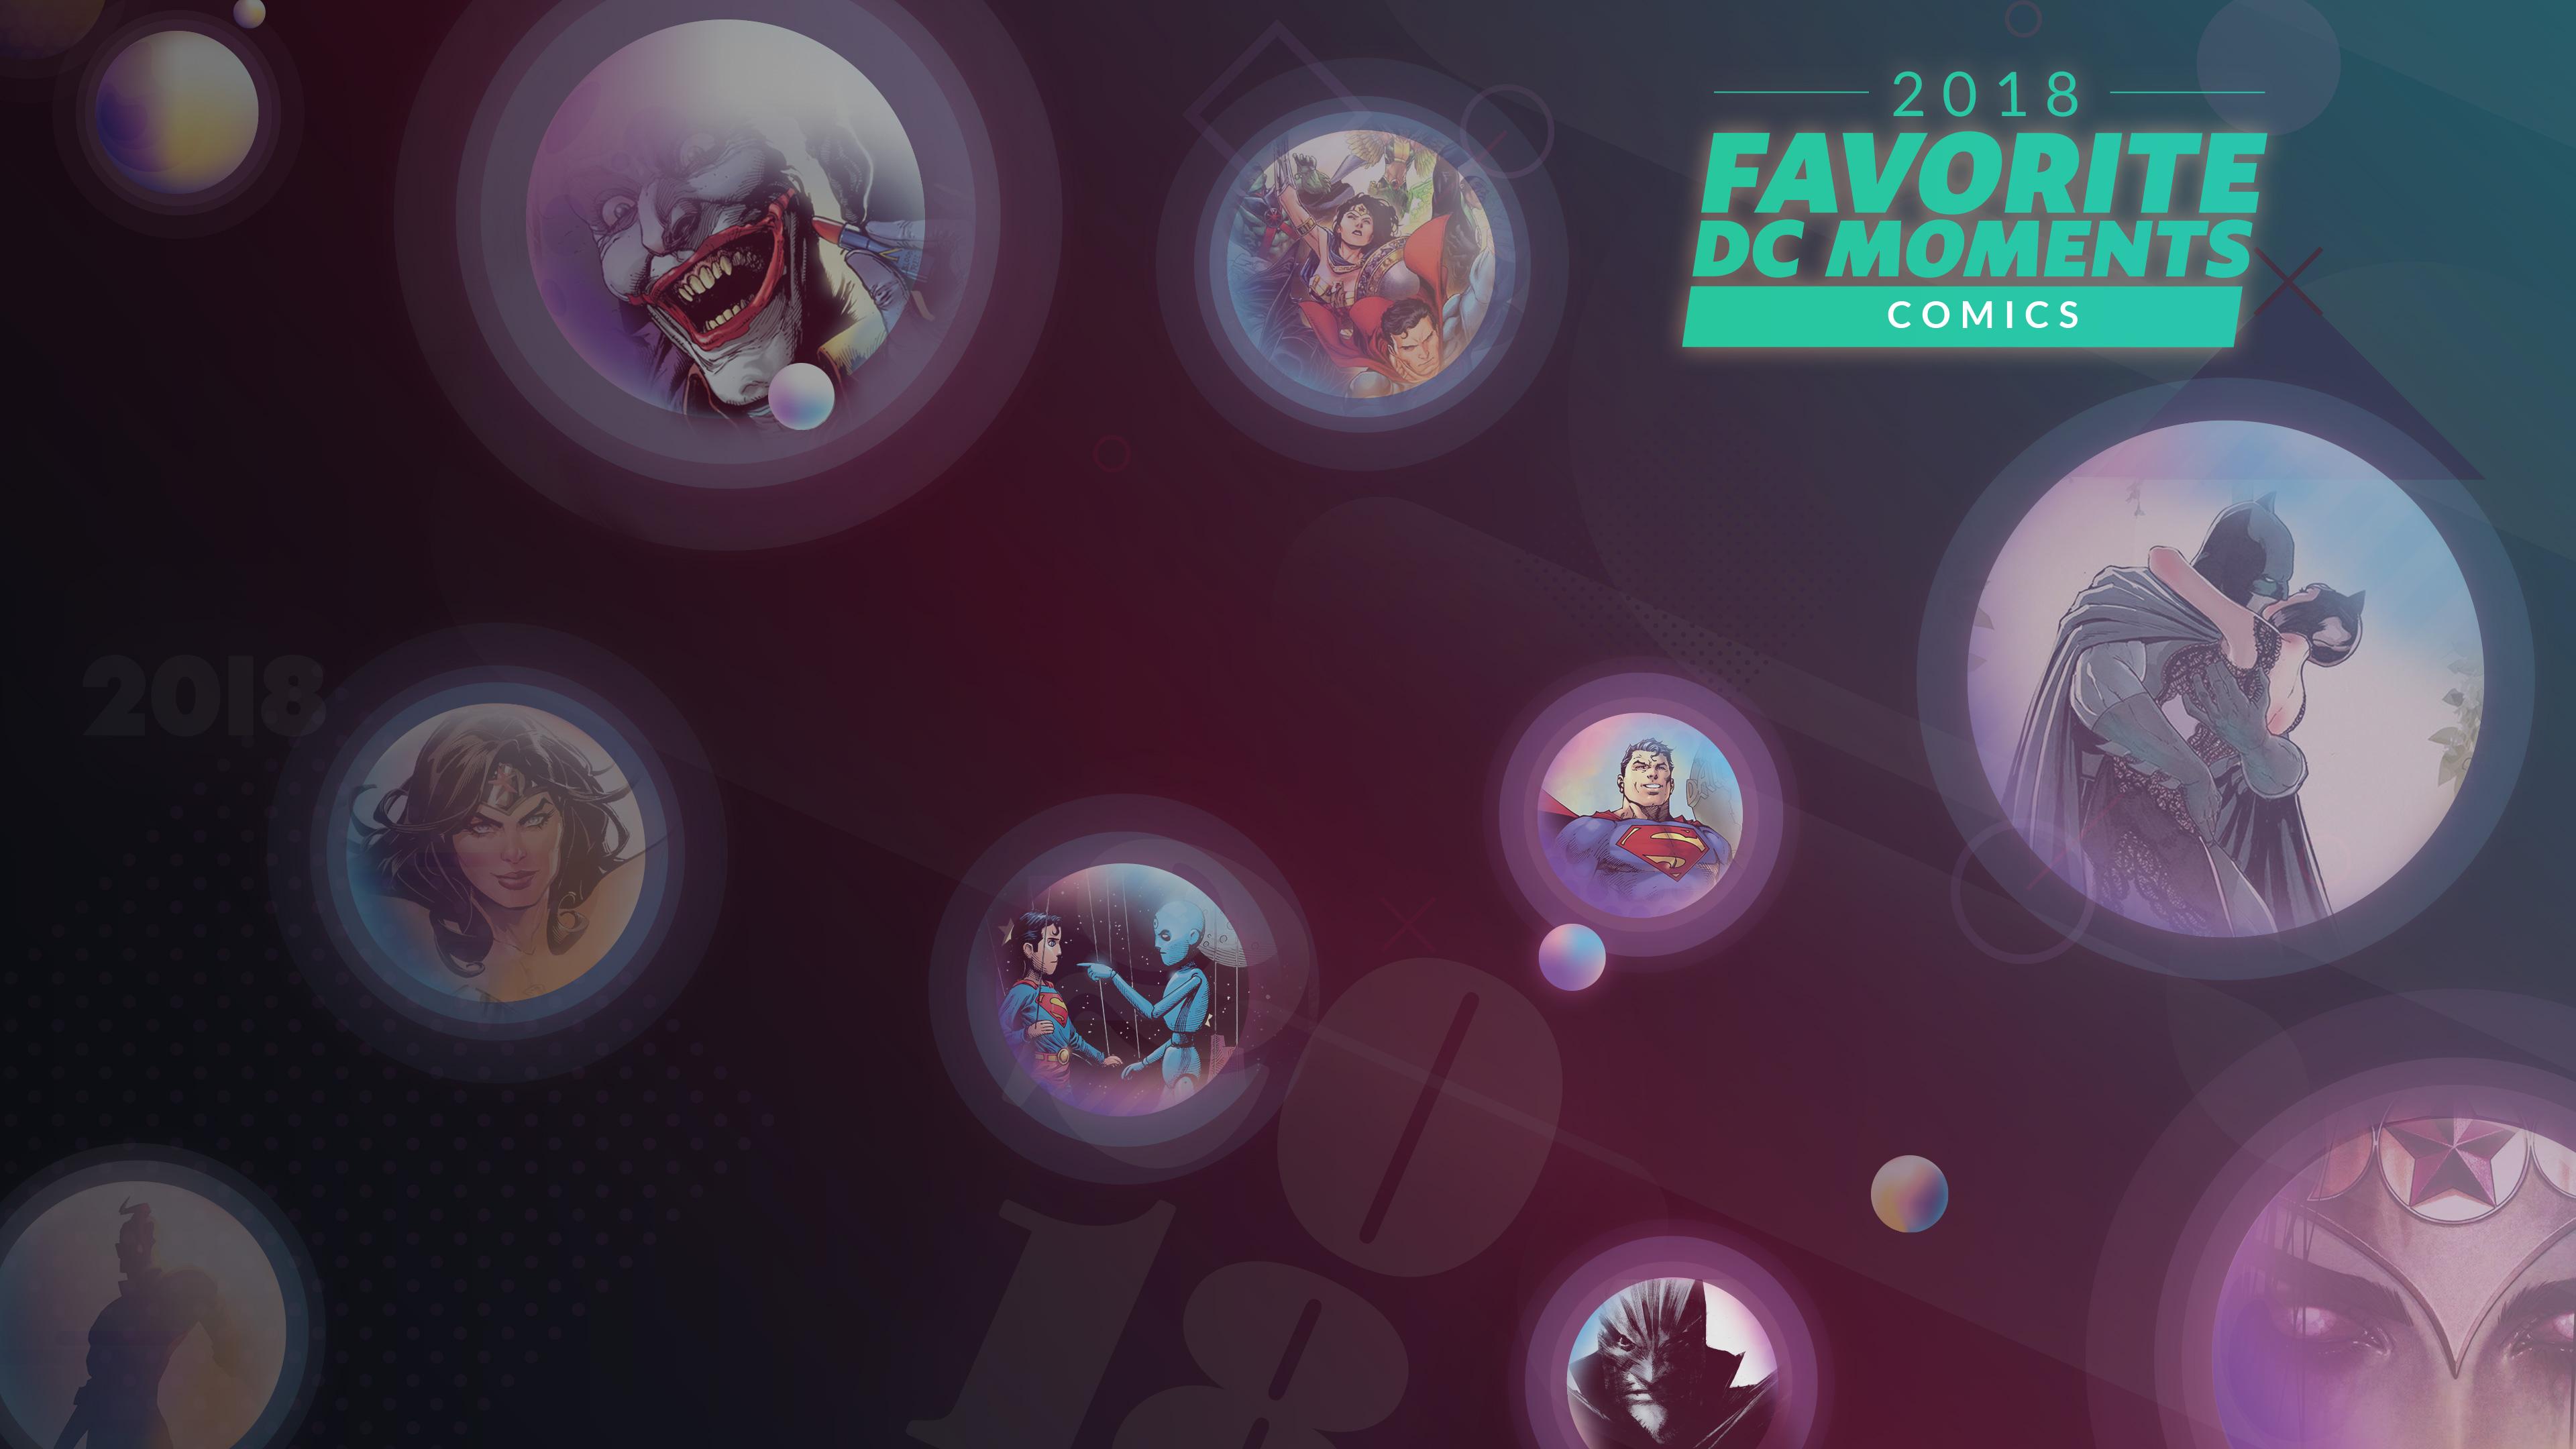 FaveDCMoments-Comics-poll-122818-v1- HEADER.jpg